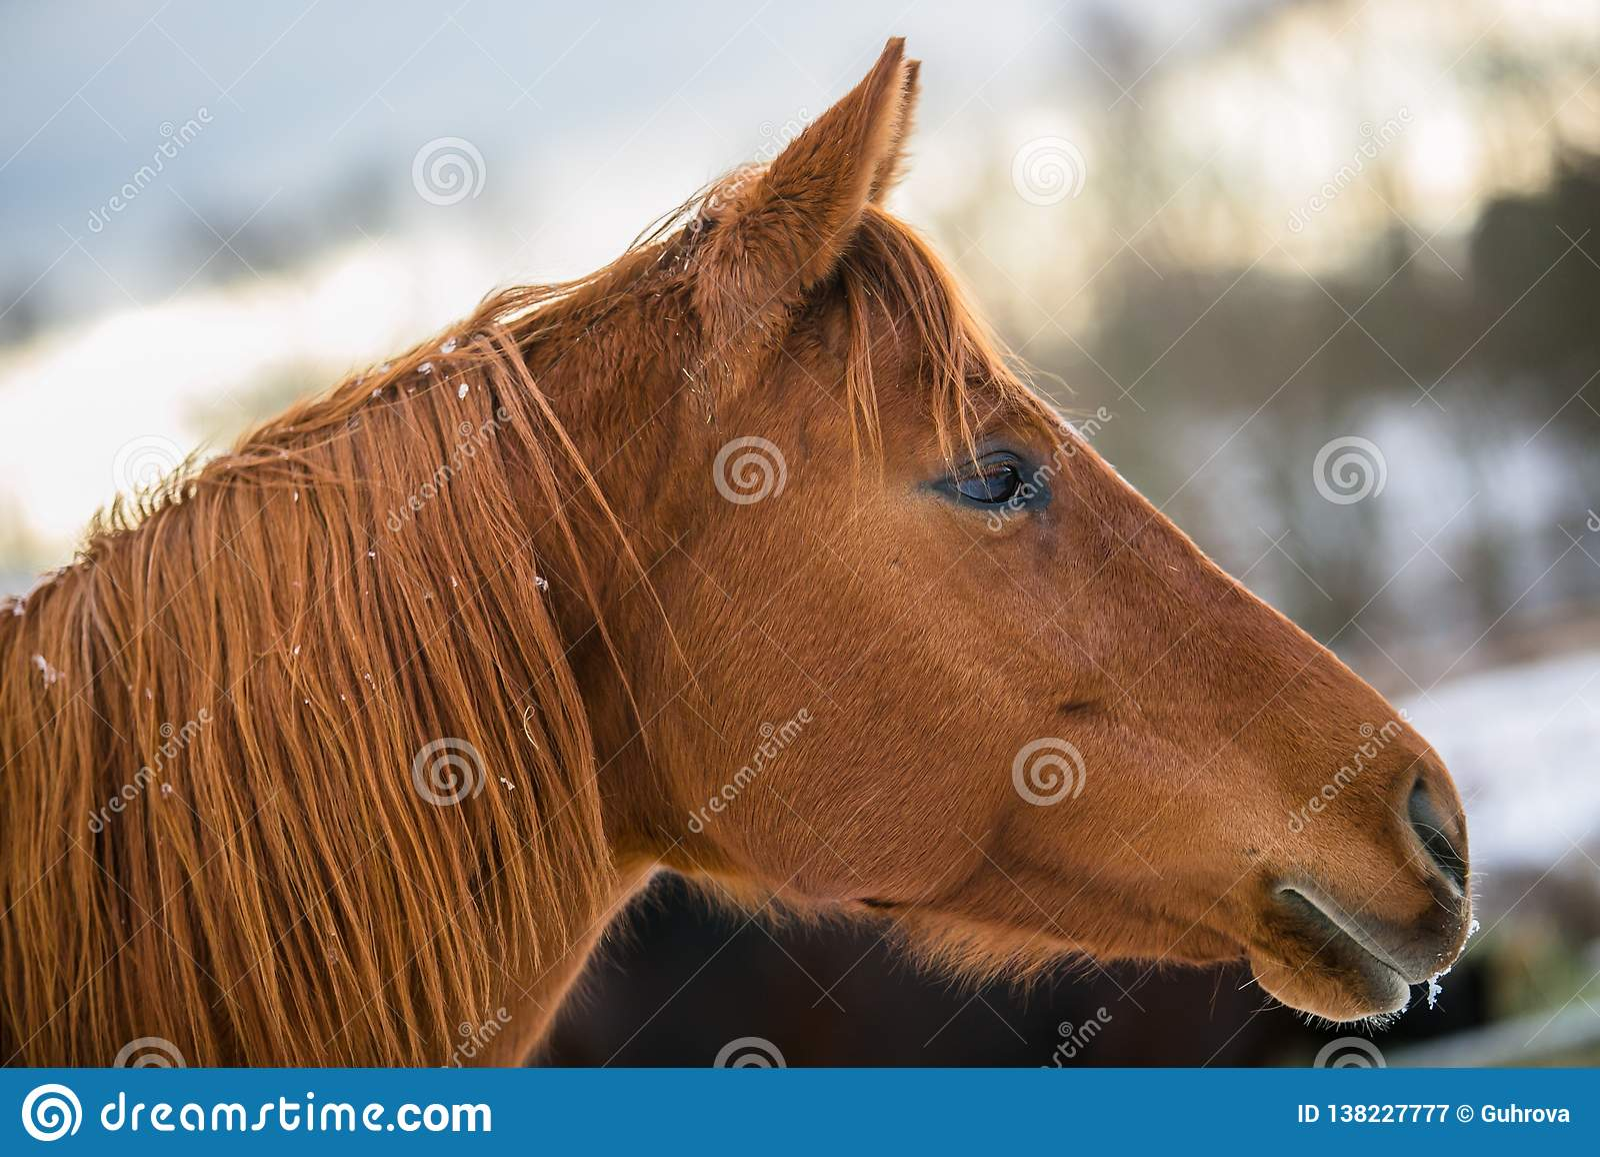 In profile portrait of chestnut horse